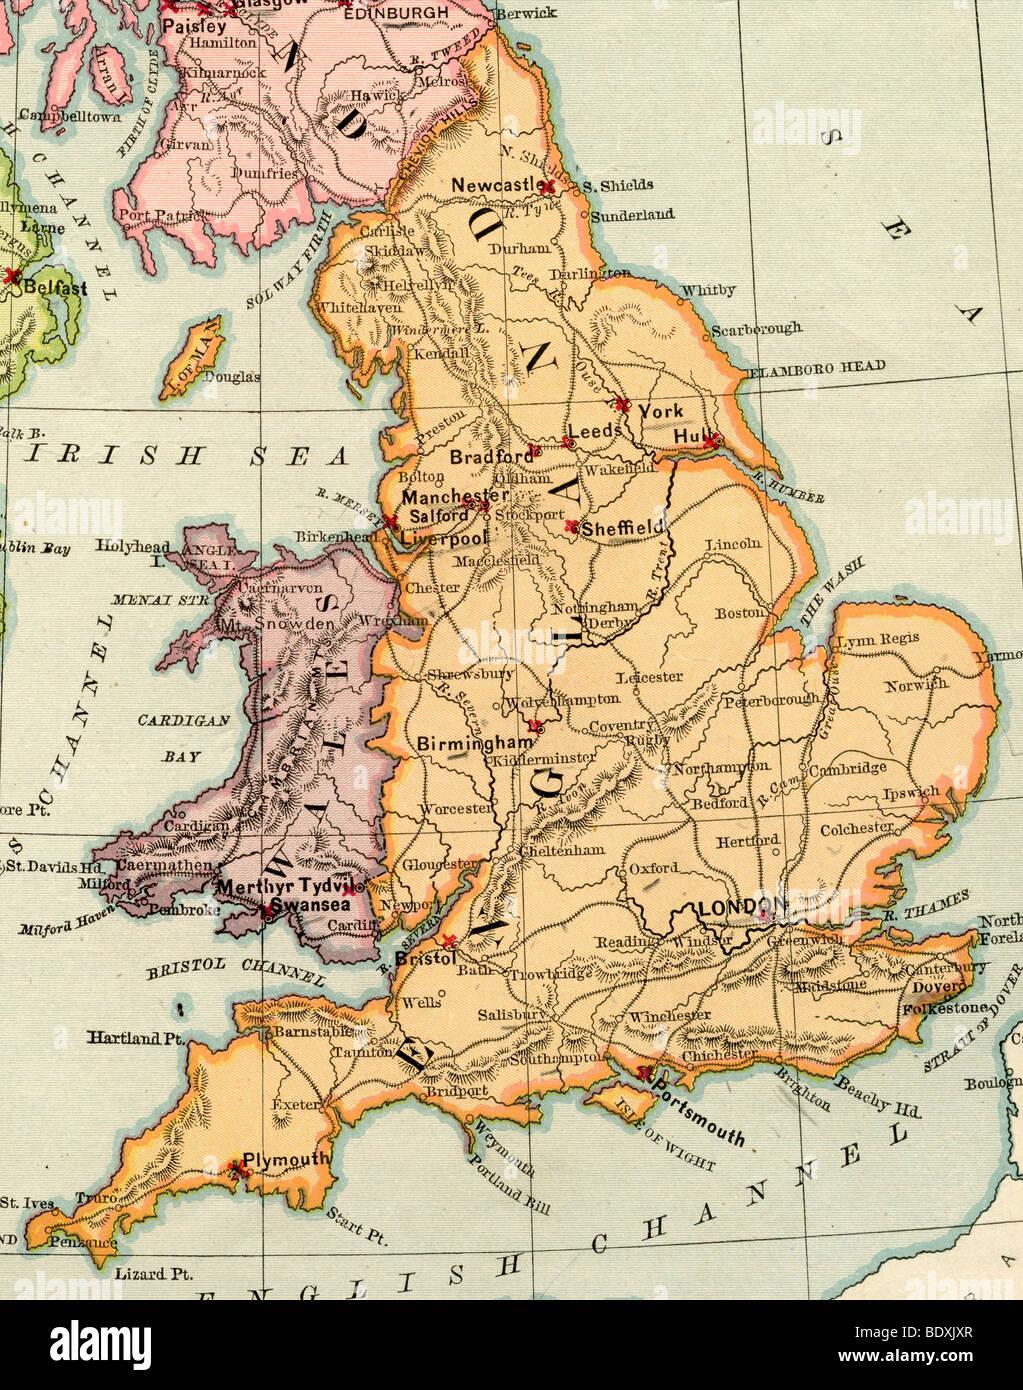 Map England Stockfotos & Map England Bilder - Alamy on